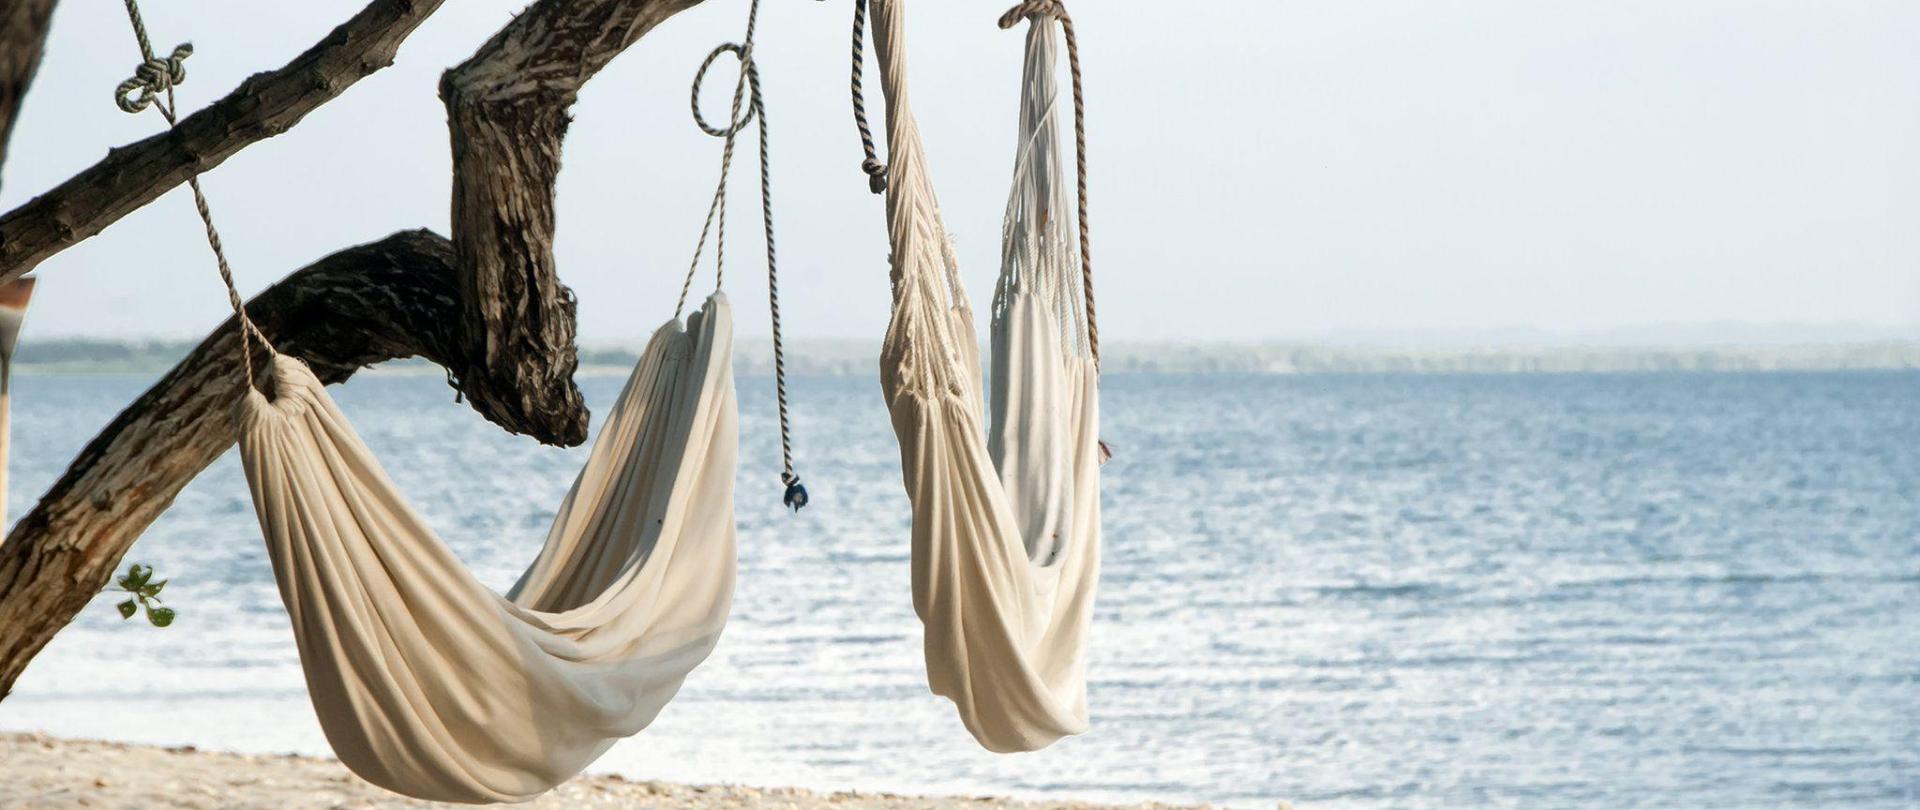 hotel-playa-manglares-isla-baru-beach-06.jpg